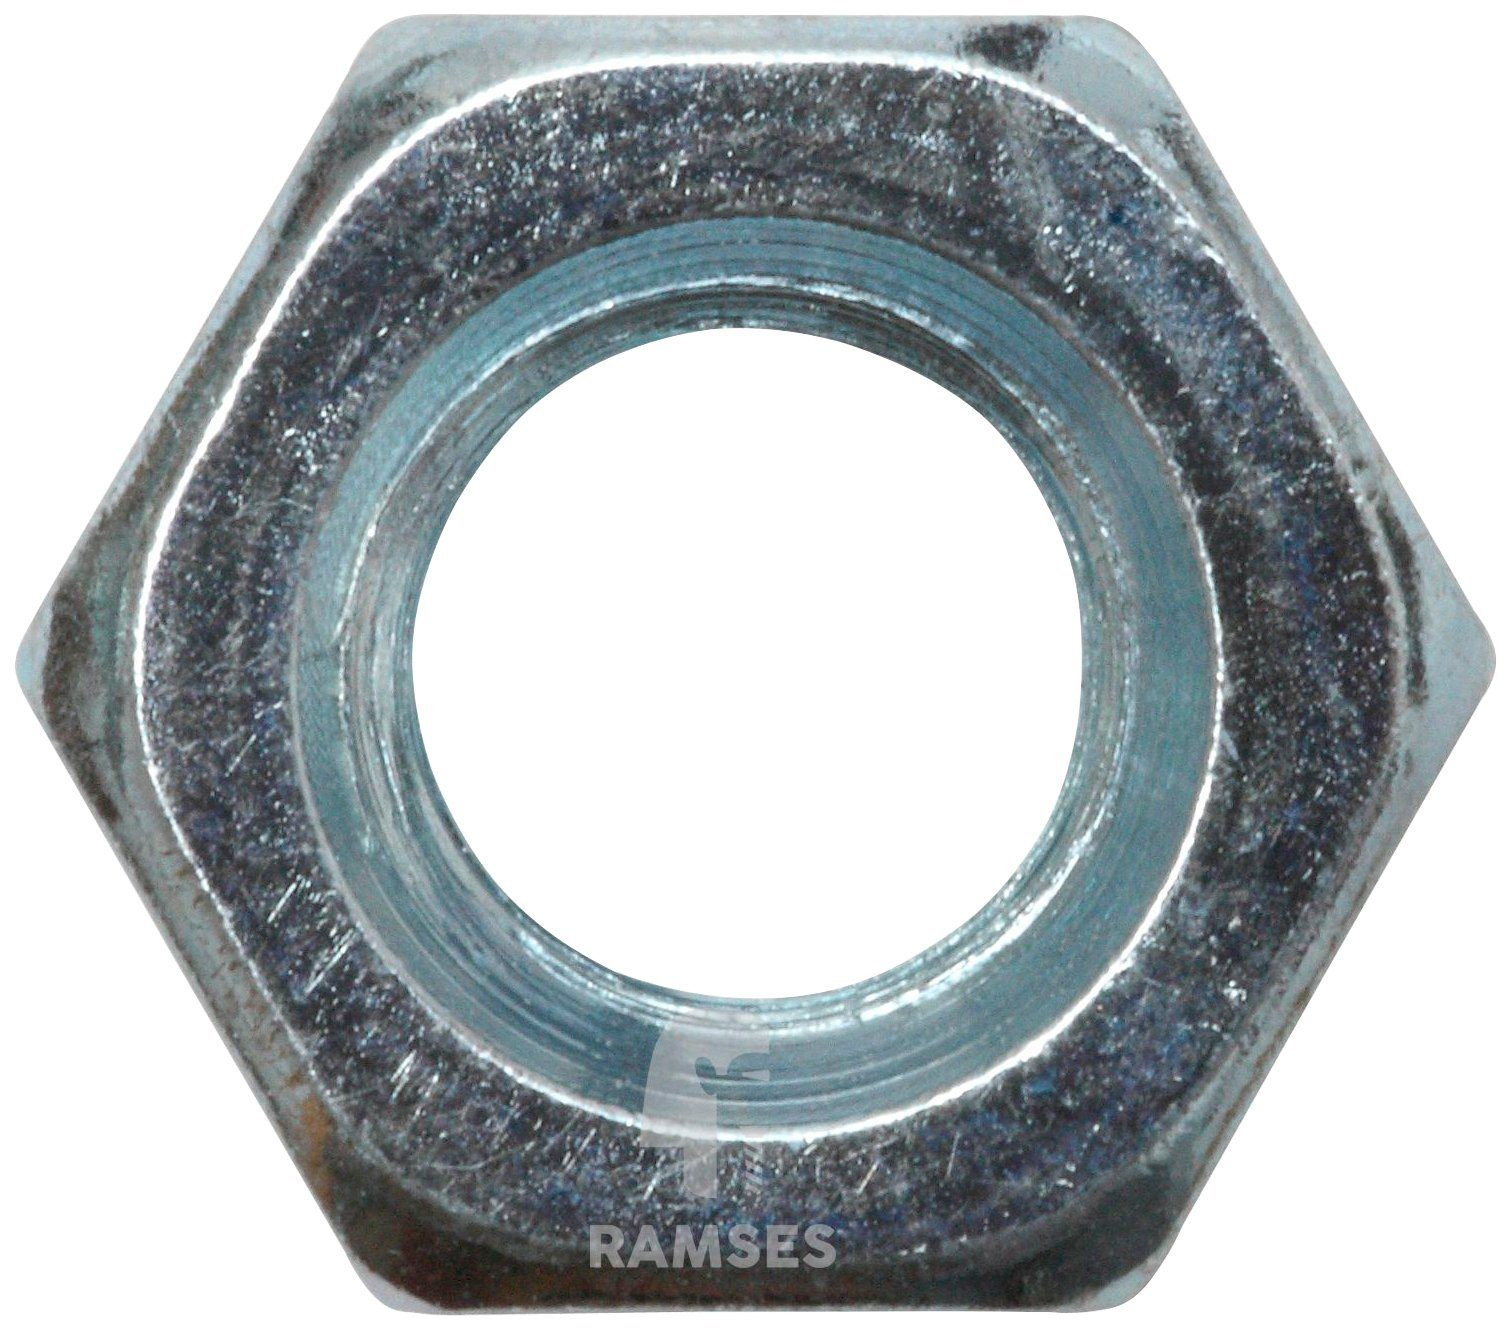 RAMSES Sechskantmutter , DIN 934 M20, 10 Stück